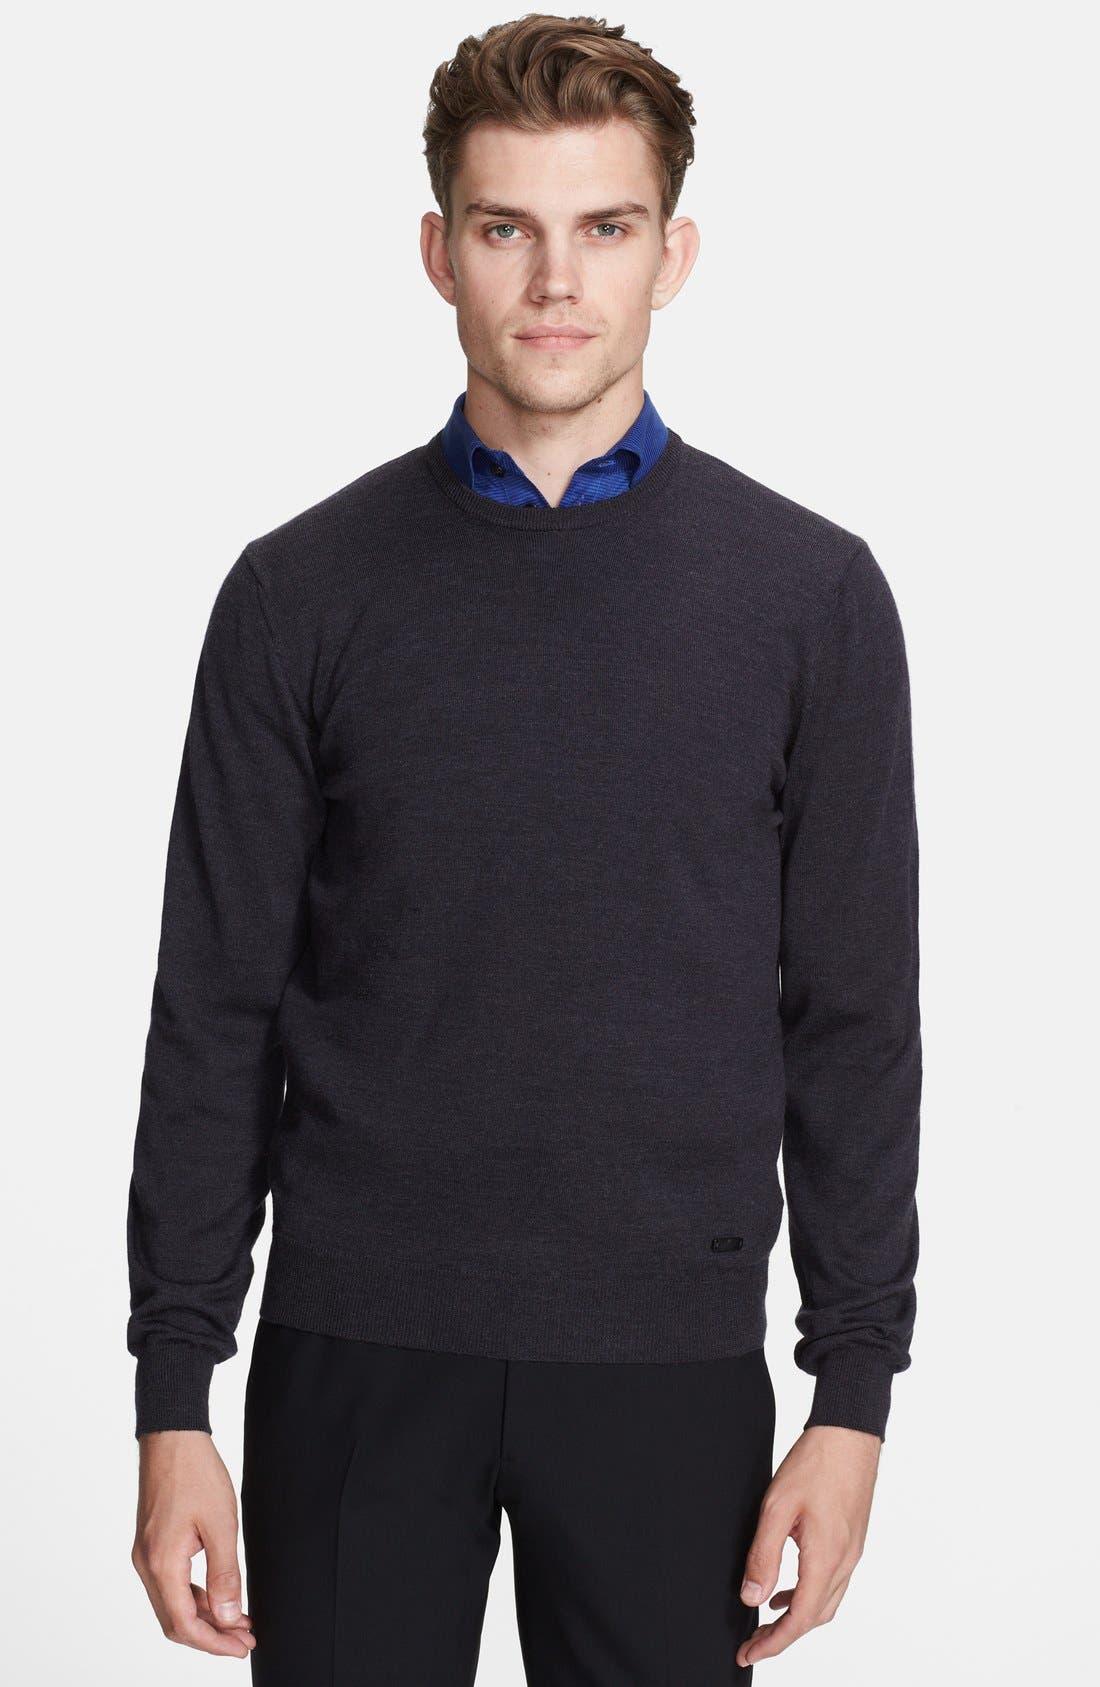 Alternate Image 1 Selected - Armani Collezioni Wool Jersey Crewneck Sweater